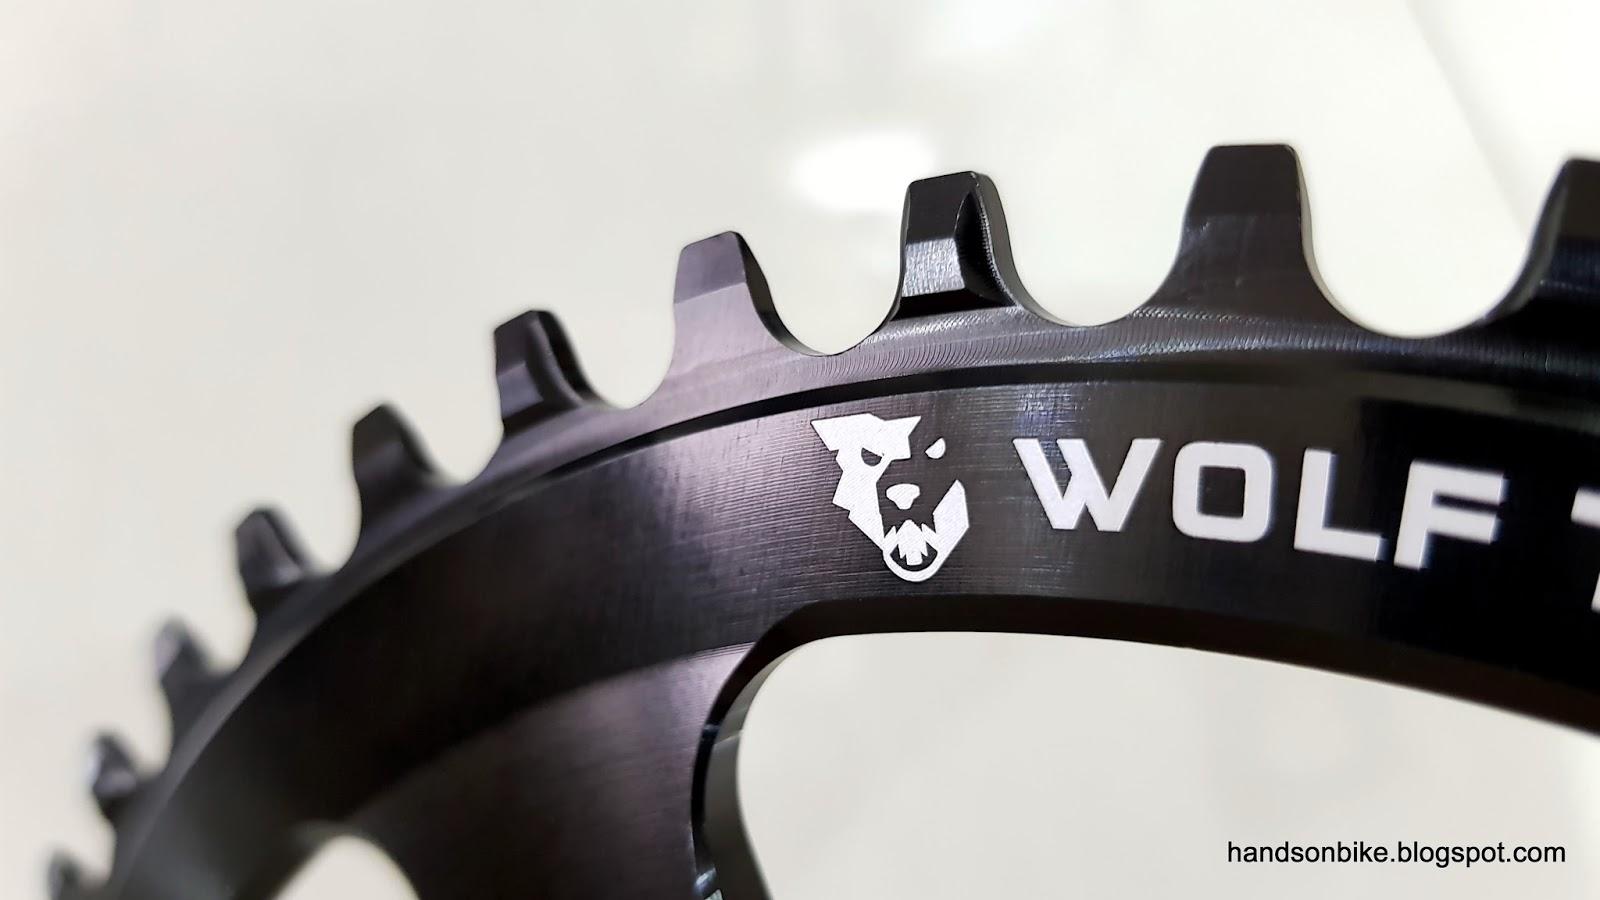 Hands On Bike: Dahon MuEX: 1x11 Drivetrain - Wolf Tooth 48T